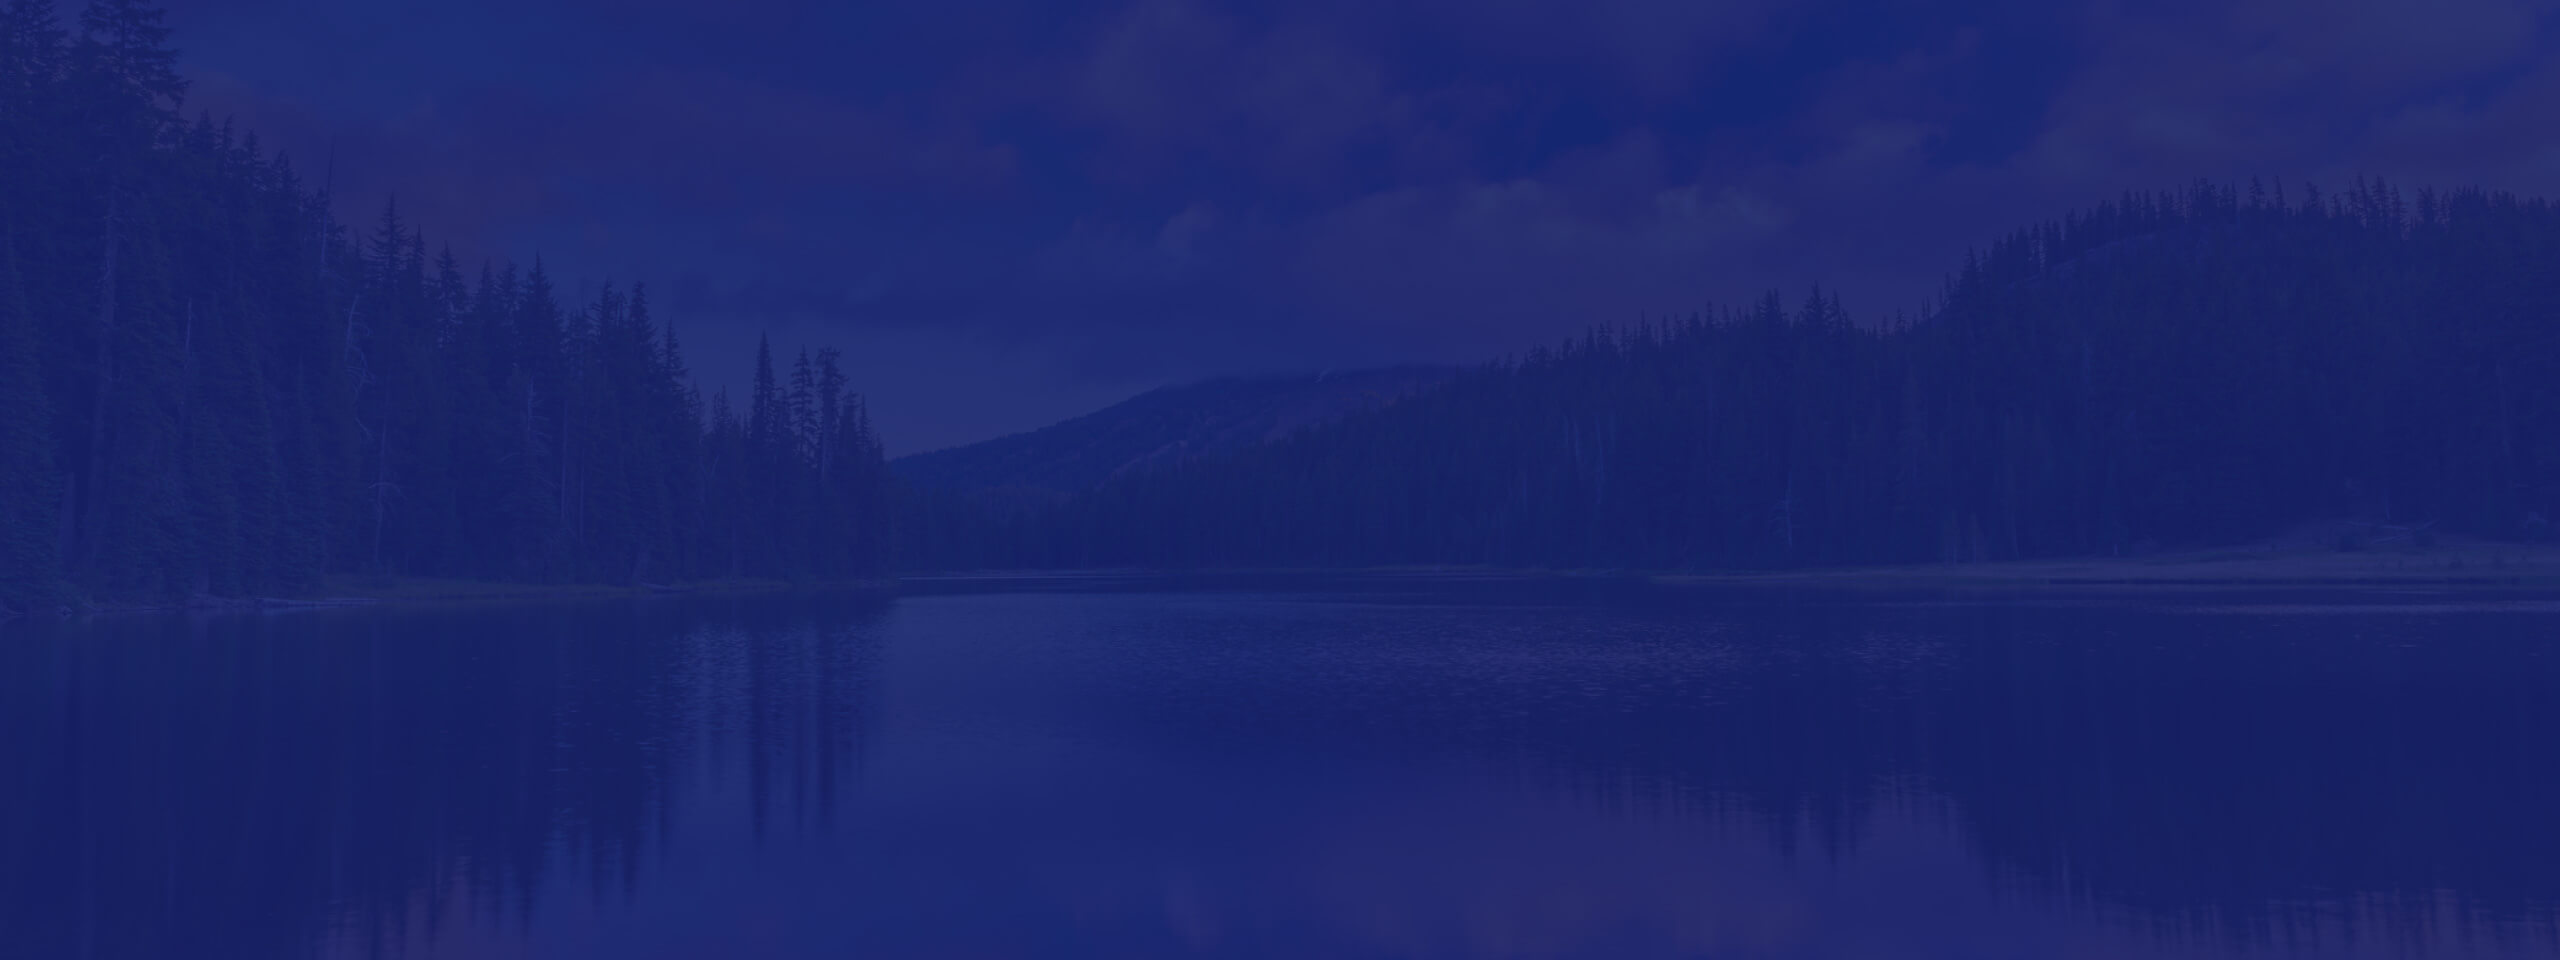 NAUPA mountains, lake background